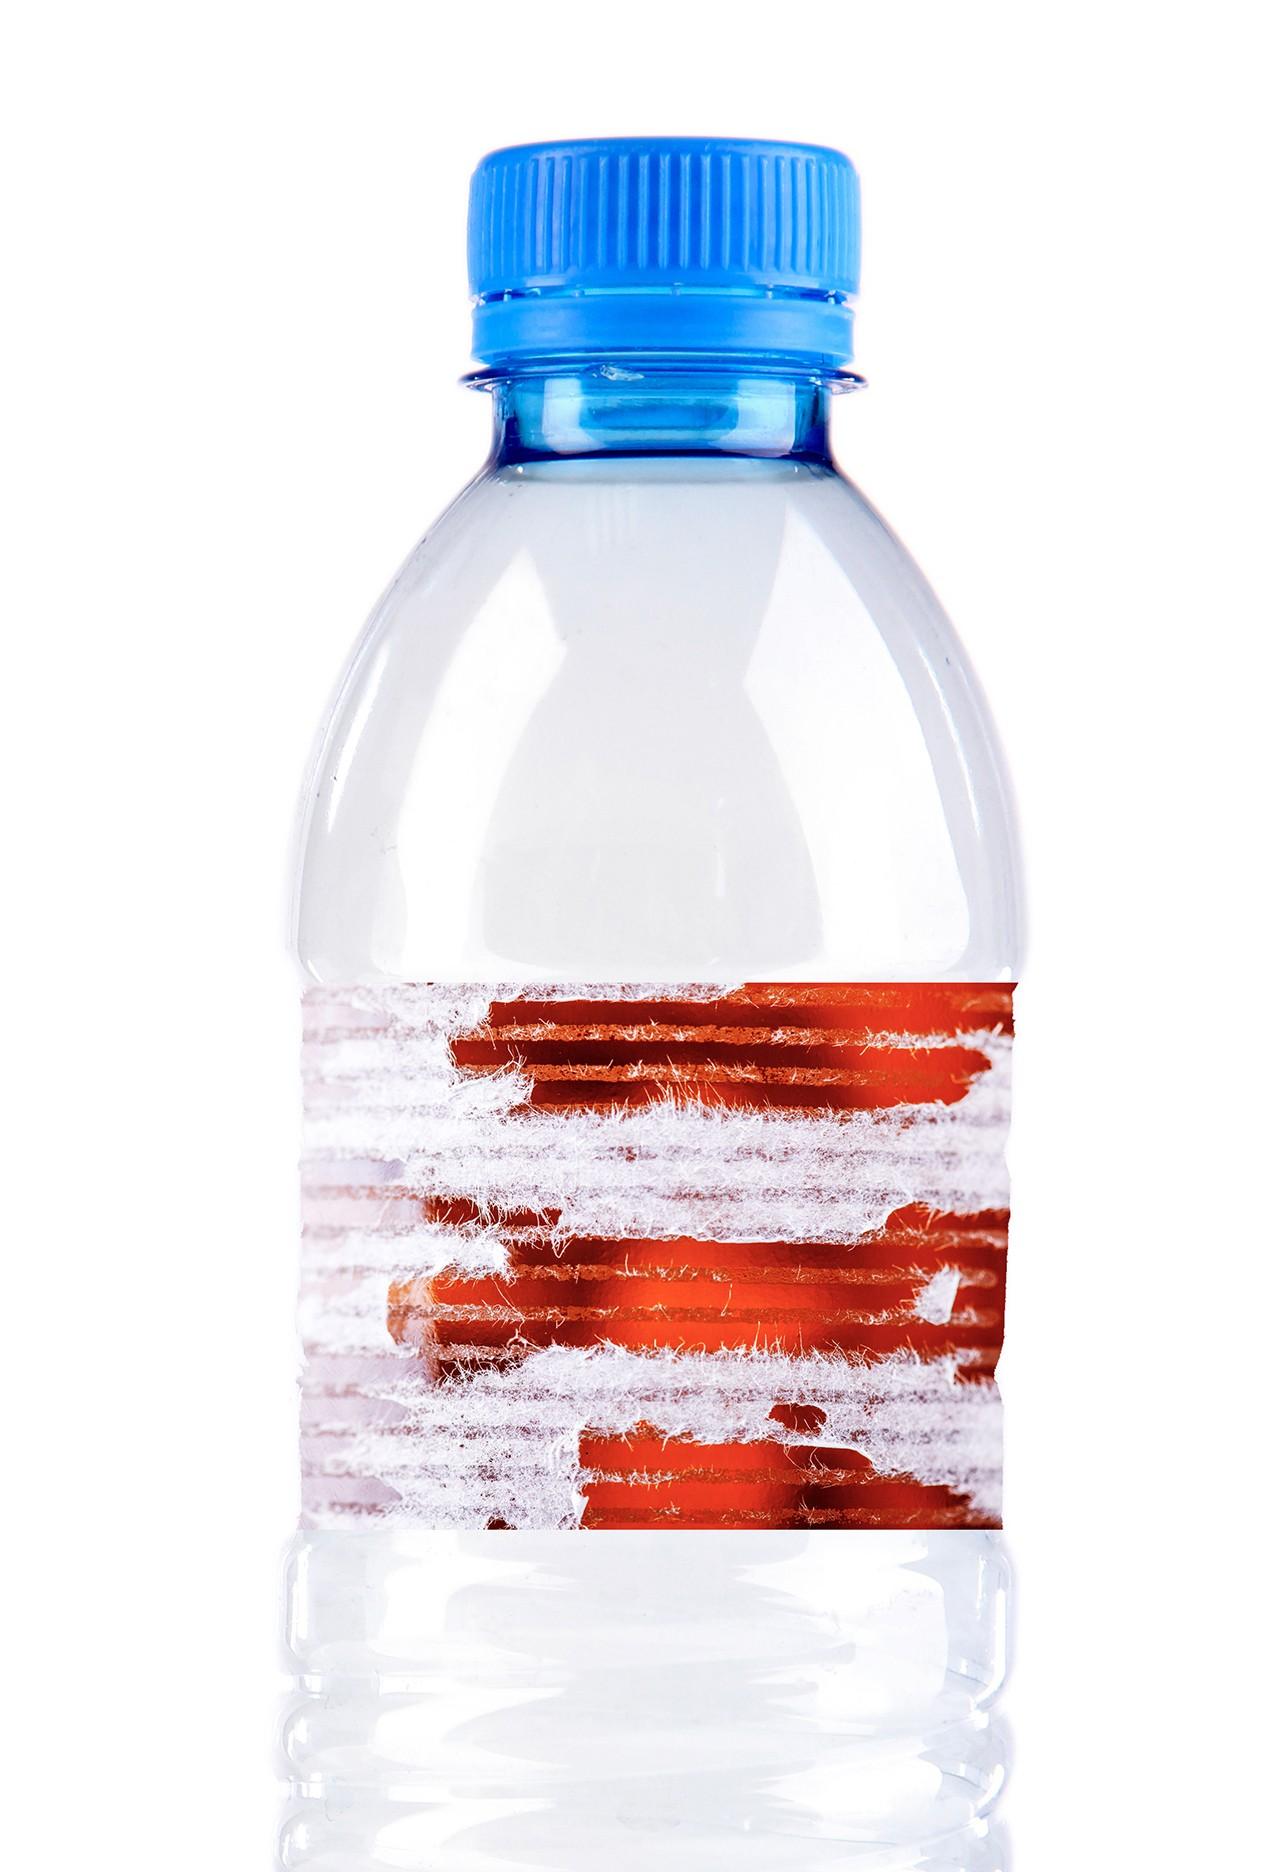 Label on plastic bottle